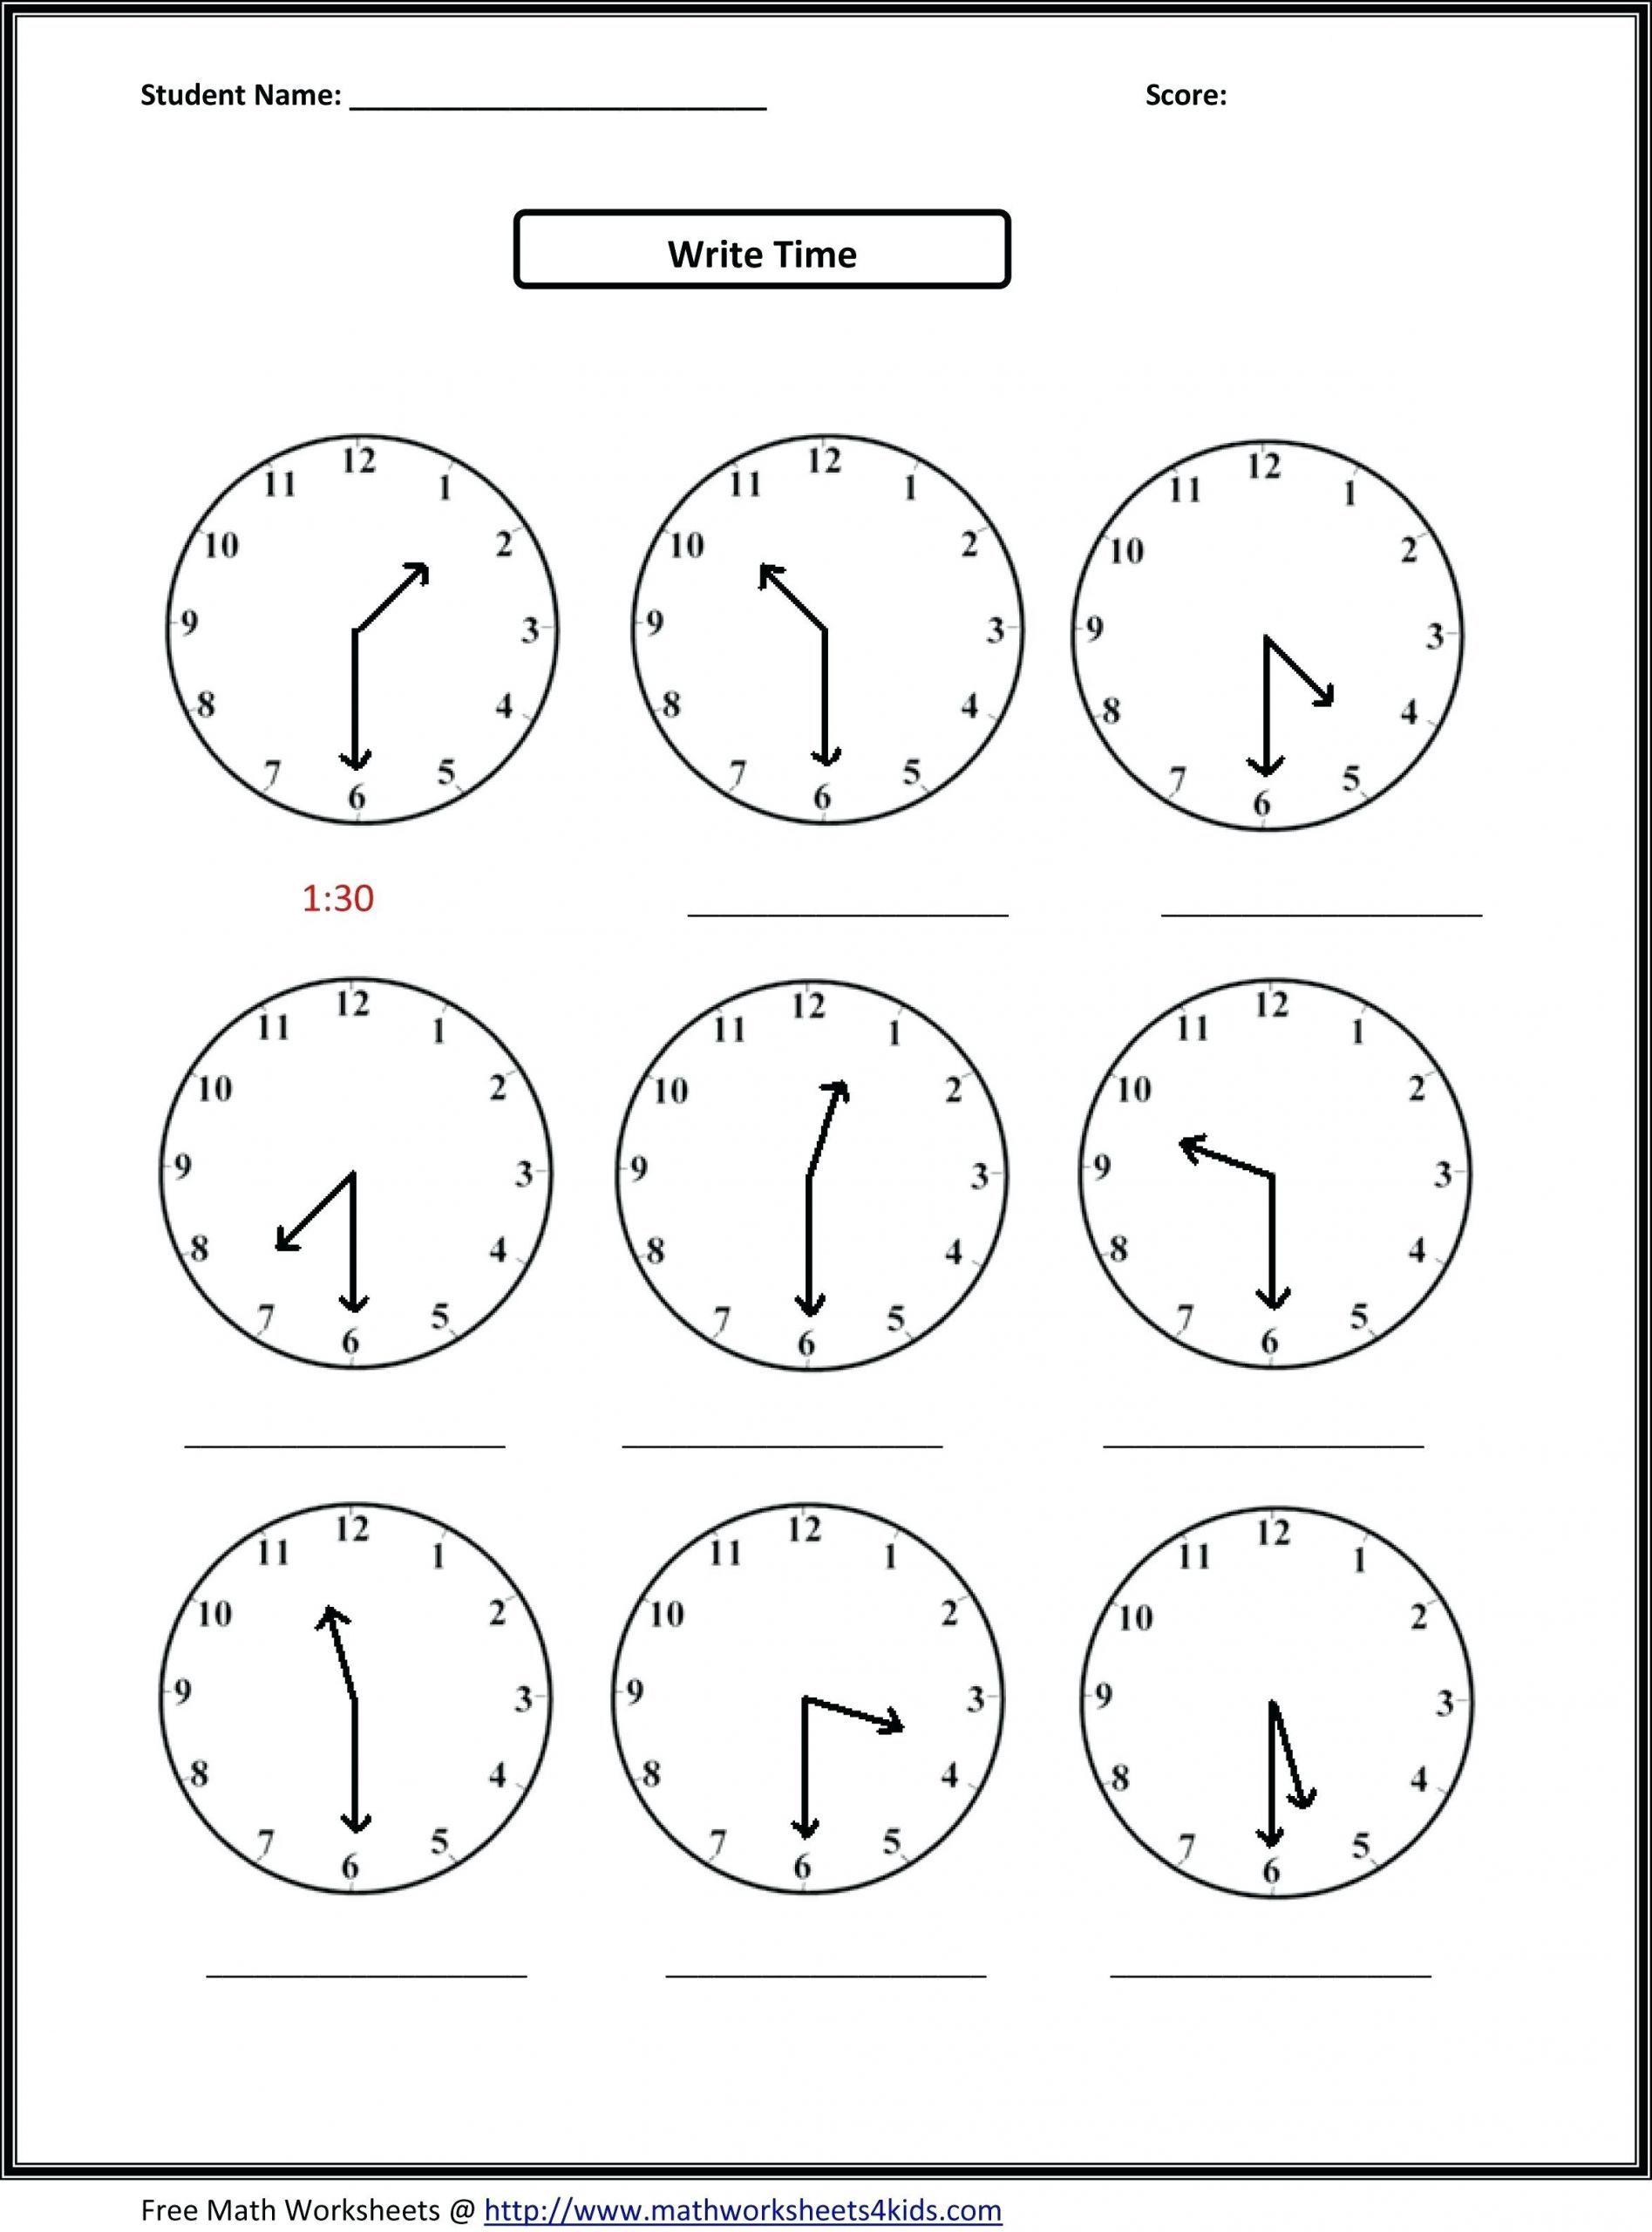 4 Free Math Worksheets Second Grade 2 Addition Add 3 Single Digit